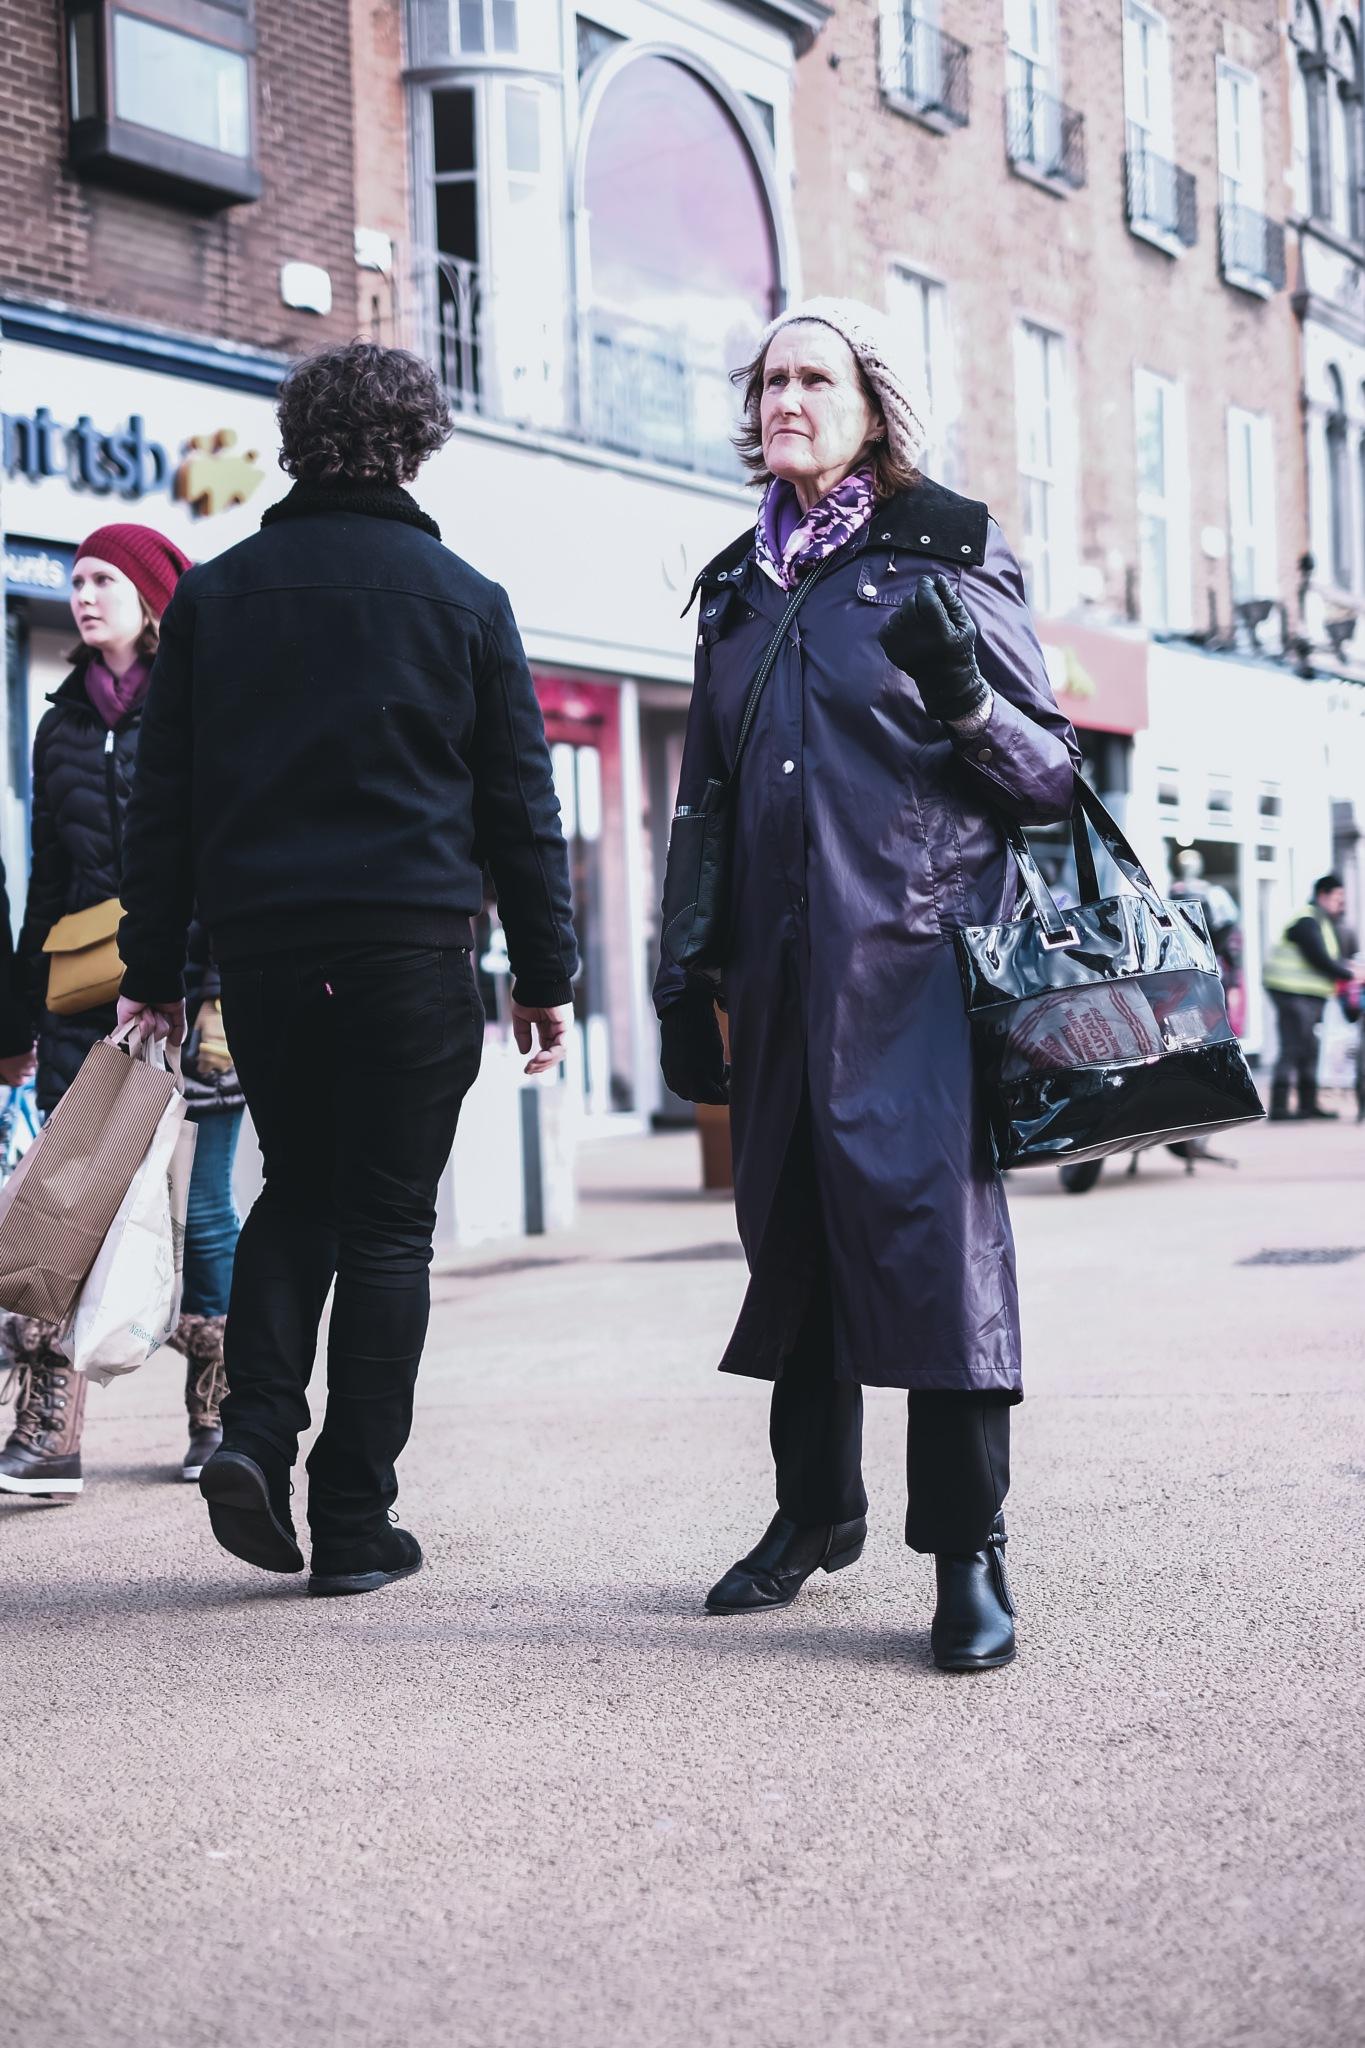 People of Dublin by onlyjamessantos